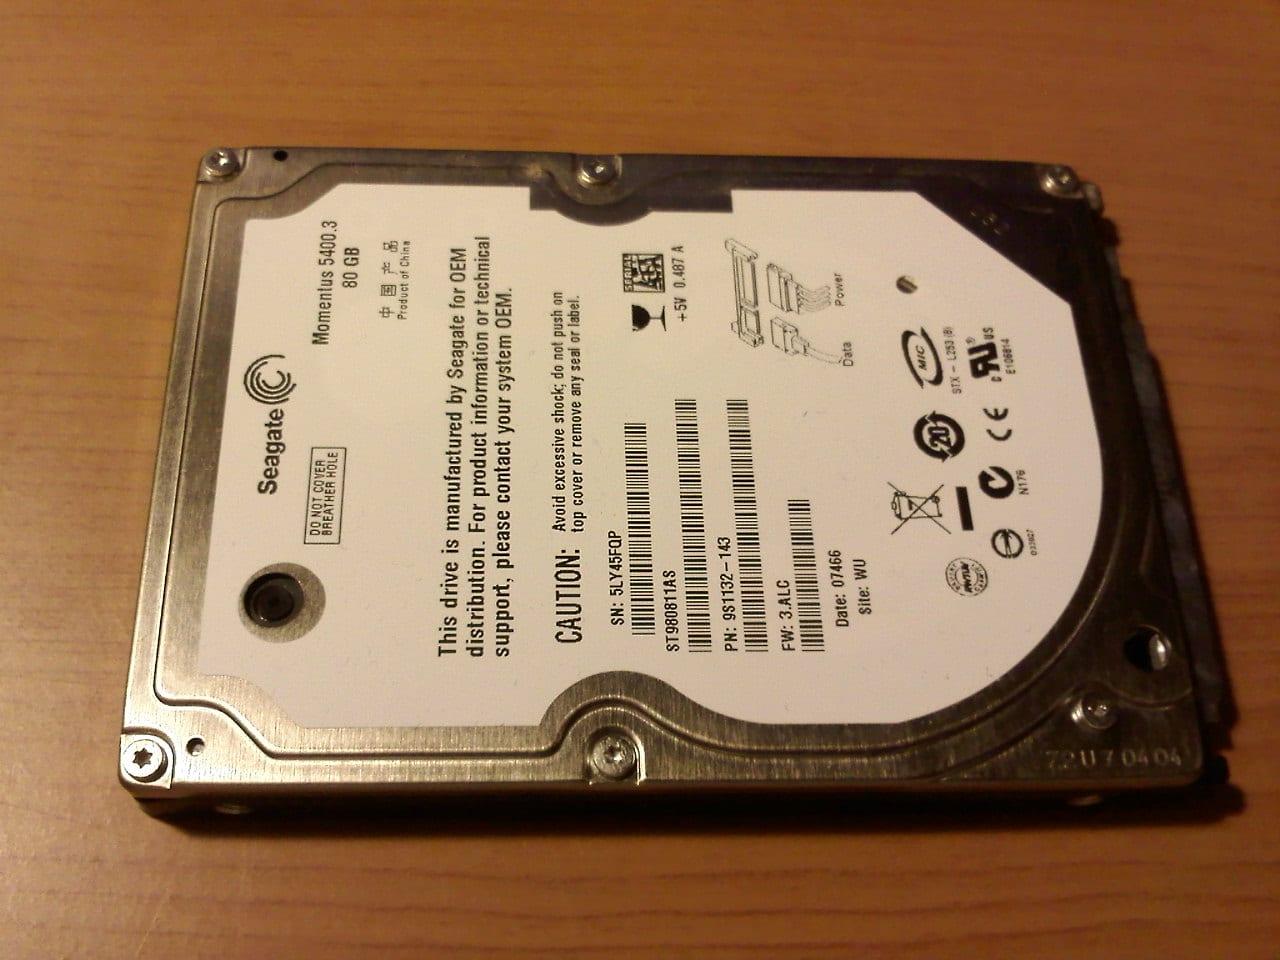 PS3 Hard Drive - 5400.3